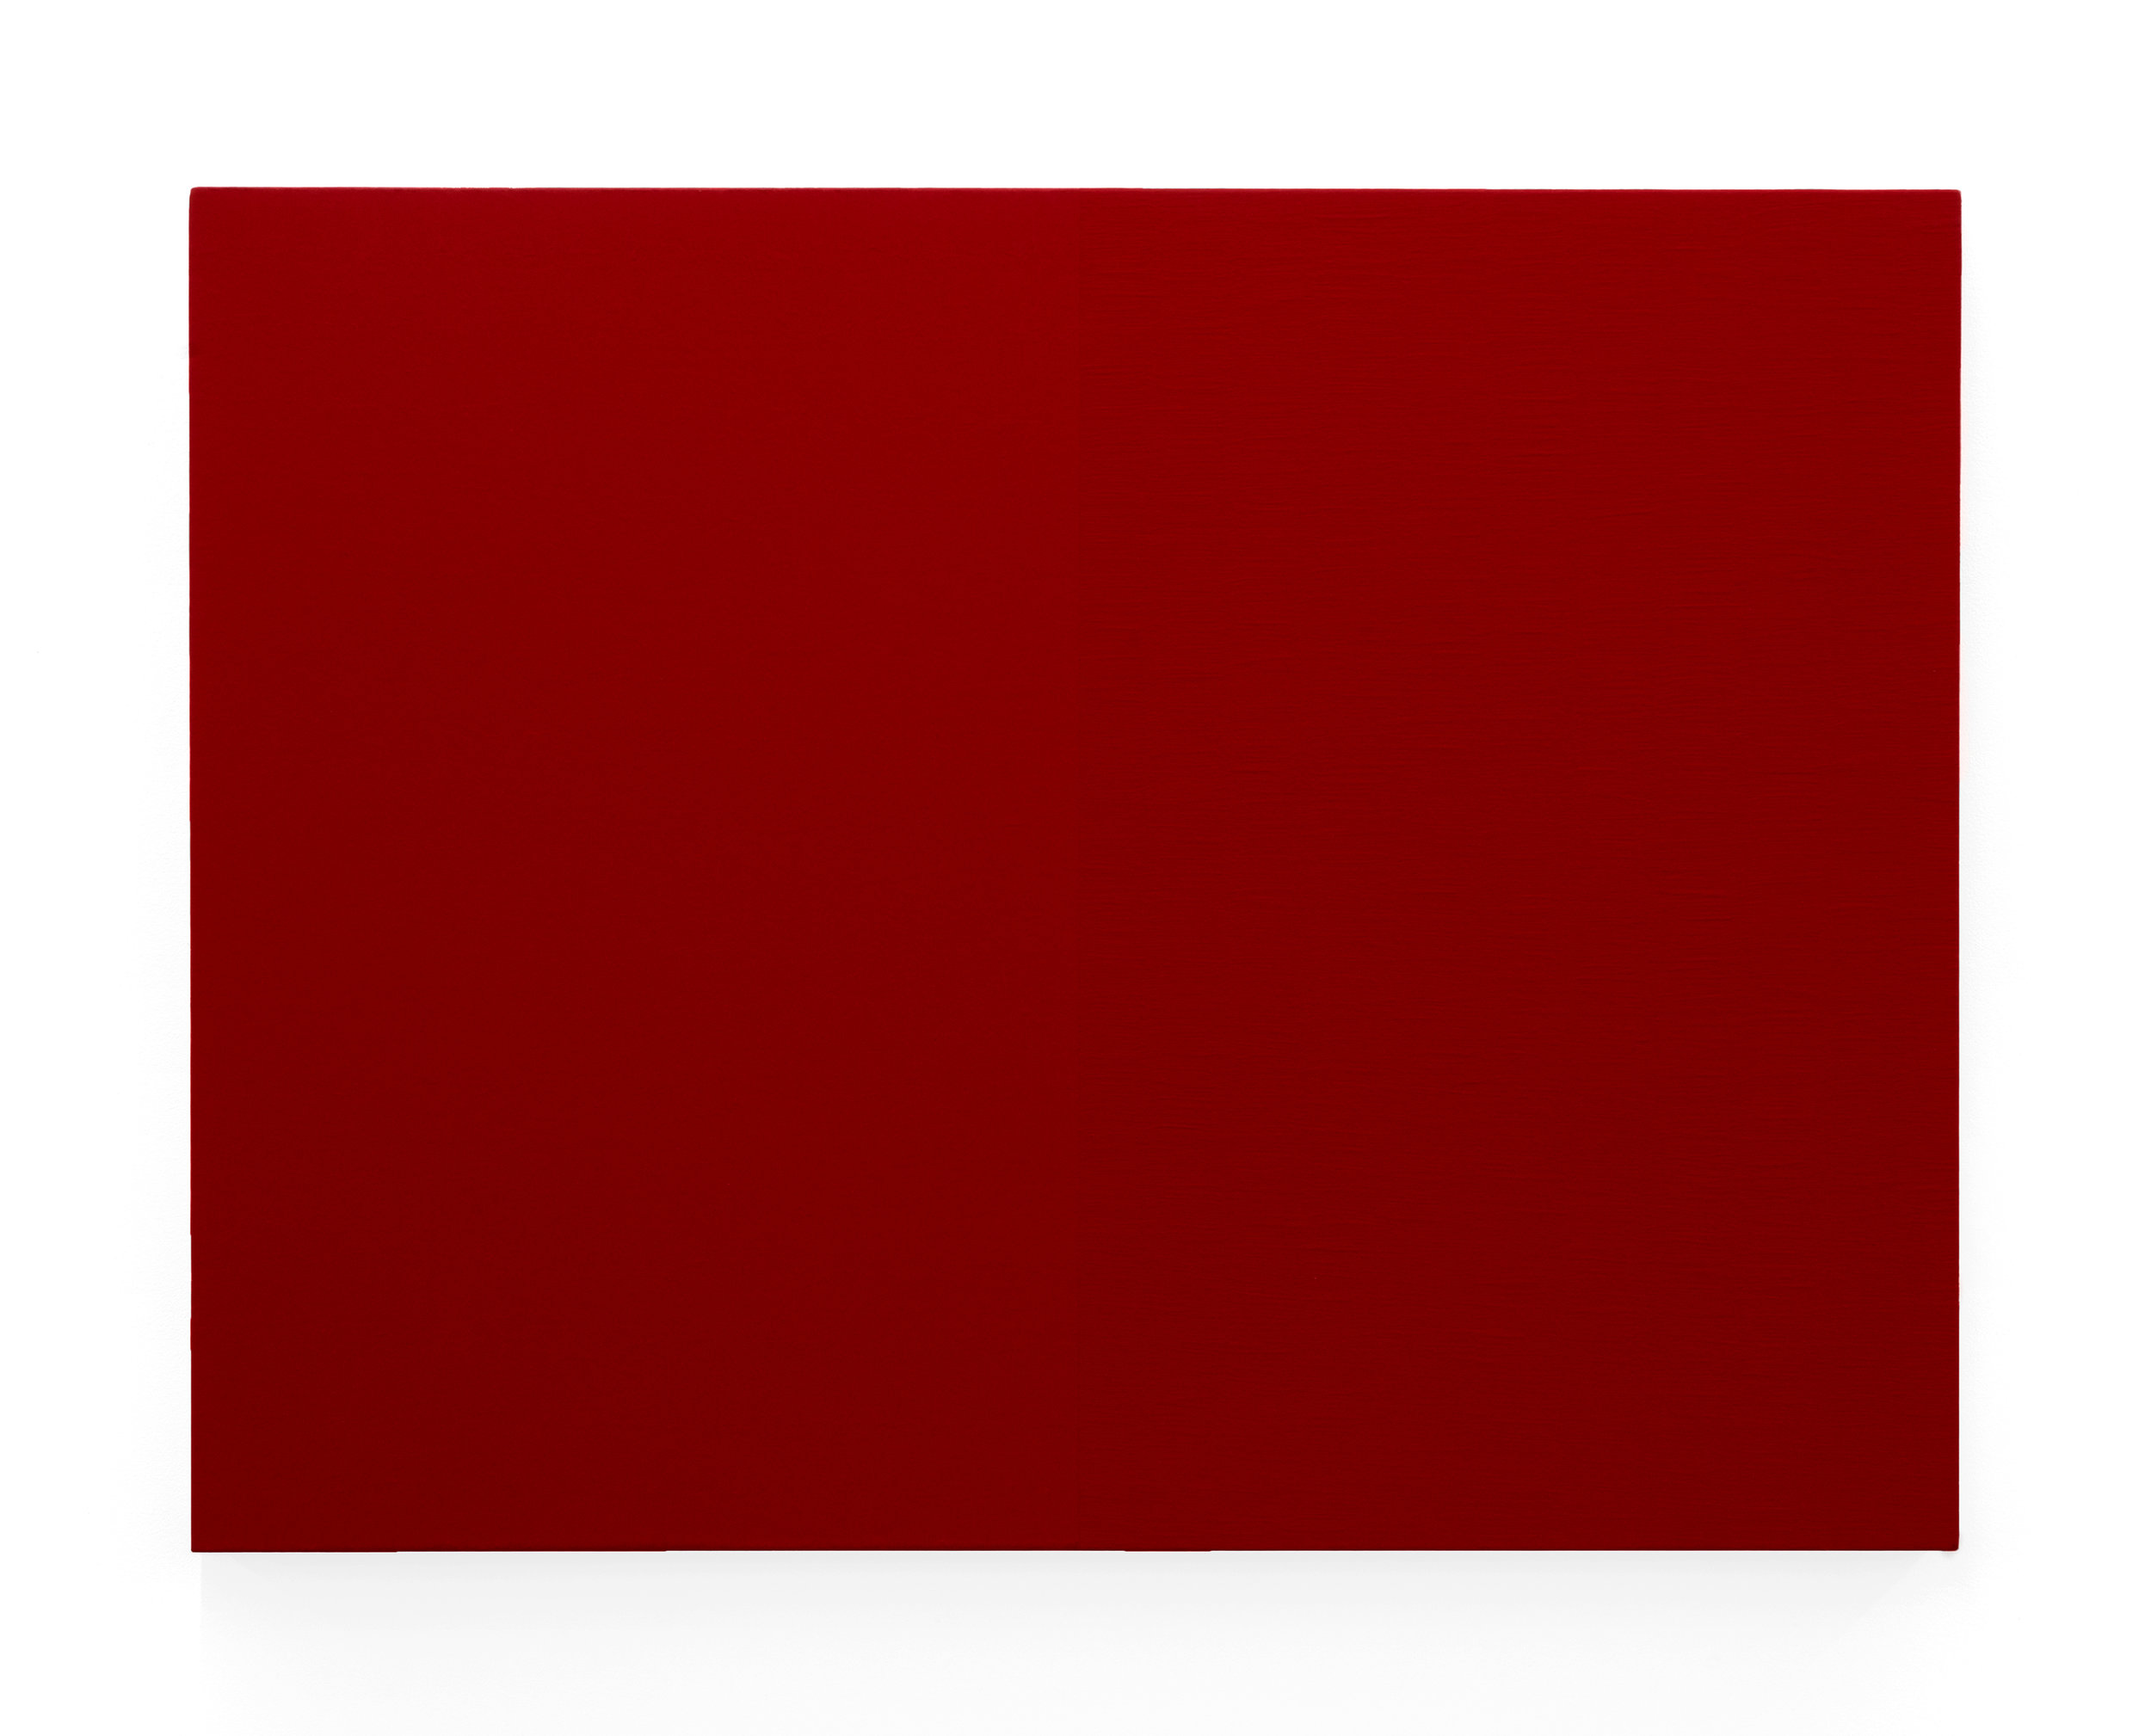 Edith Baumann  Untitled #5,  1979 acrylic on canvas 36 x 46 - 3/4 inches